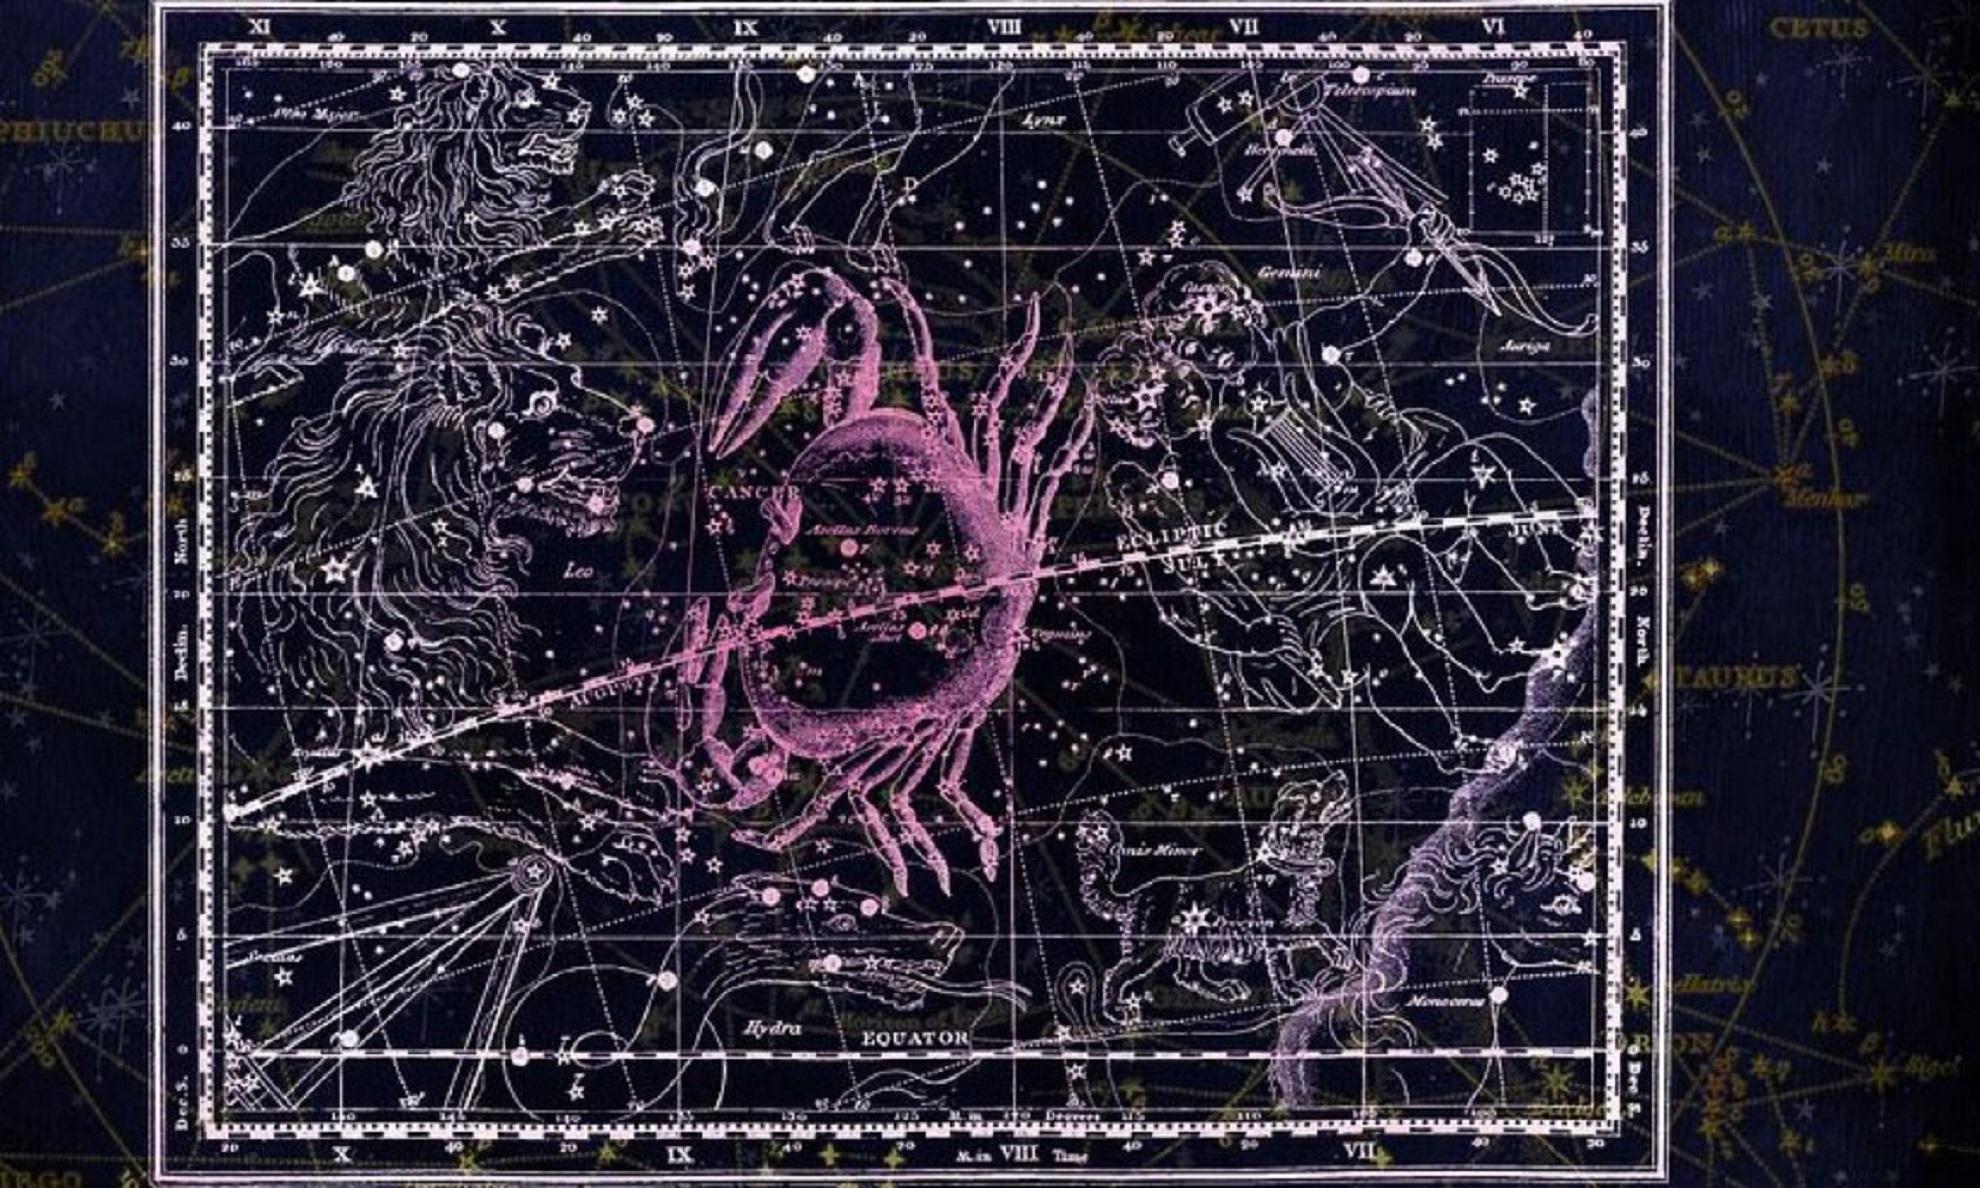 Horoscop luna august 2020 | Sanatate, Dragoste, Bani - 24h ...  |Horoscop 24 Septembrie 2020